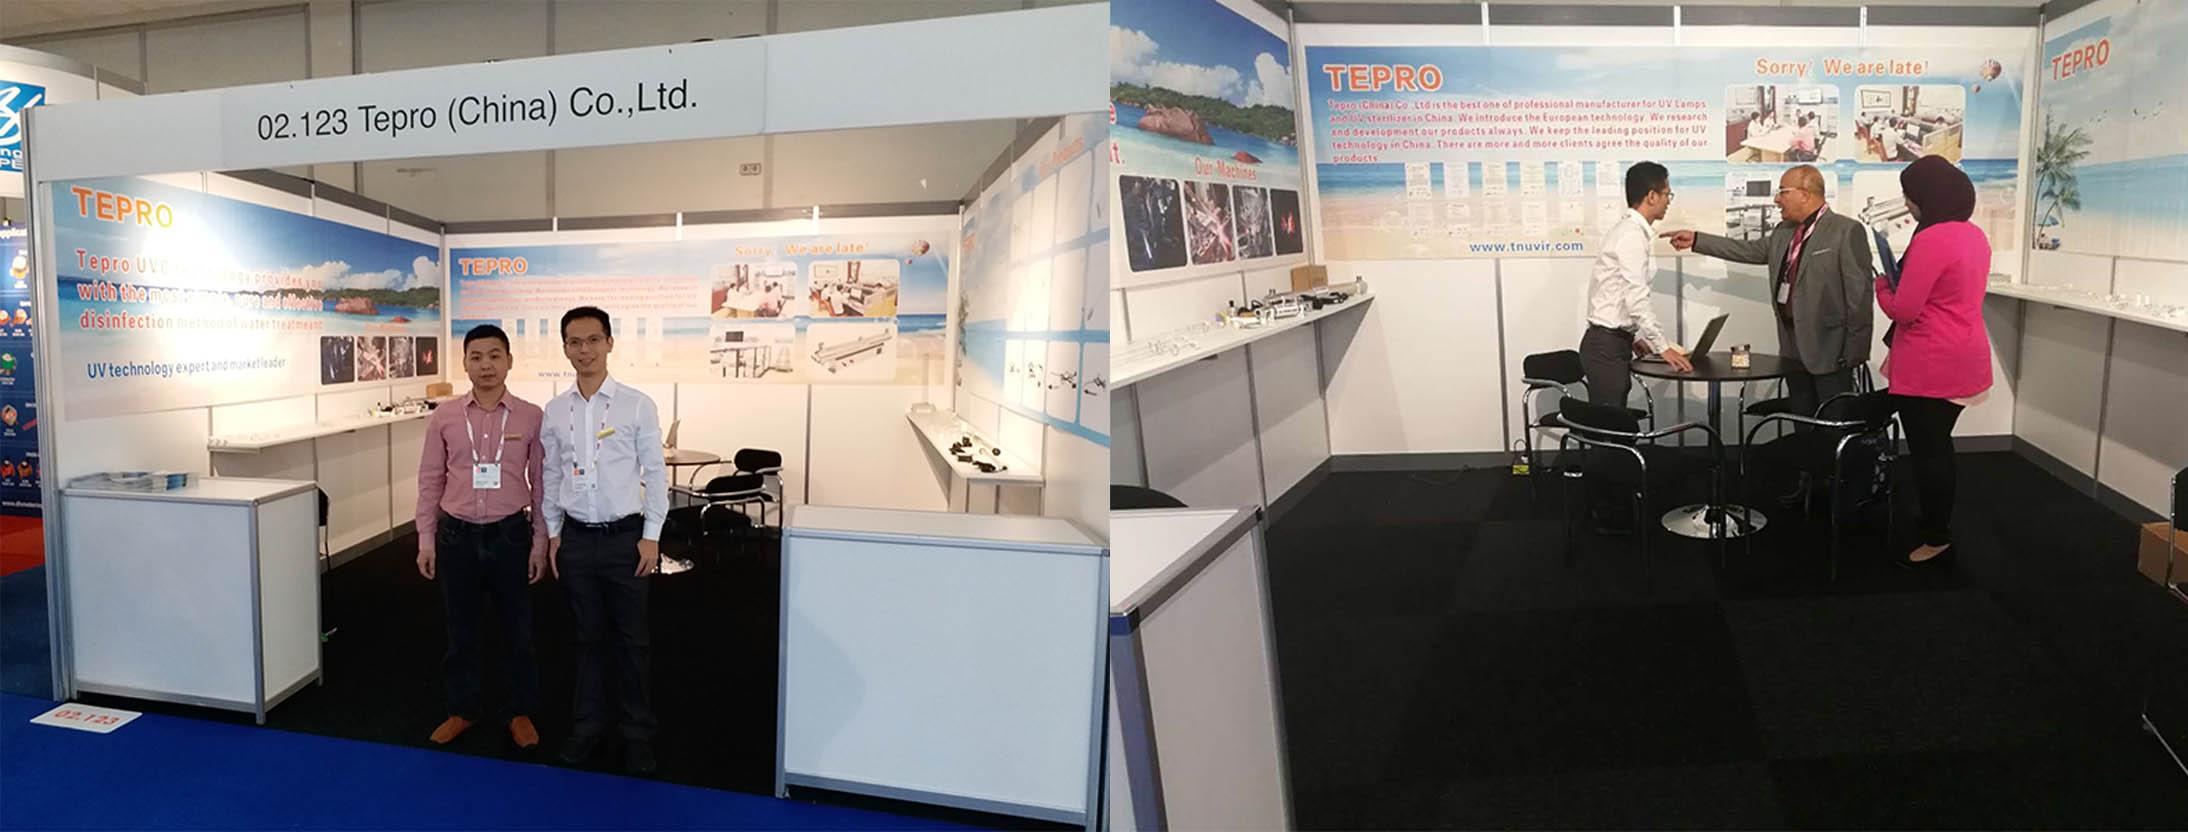 Tepro-Read Aquatech Amsterdam News On Tepro Uv Lamps-2